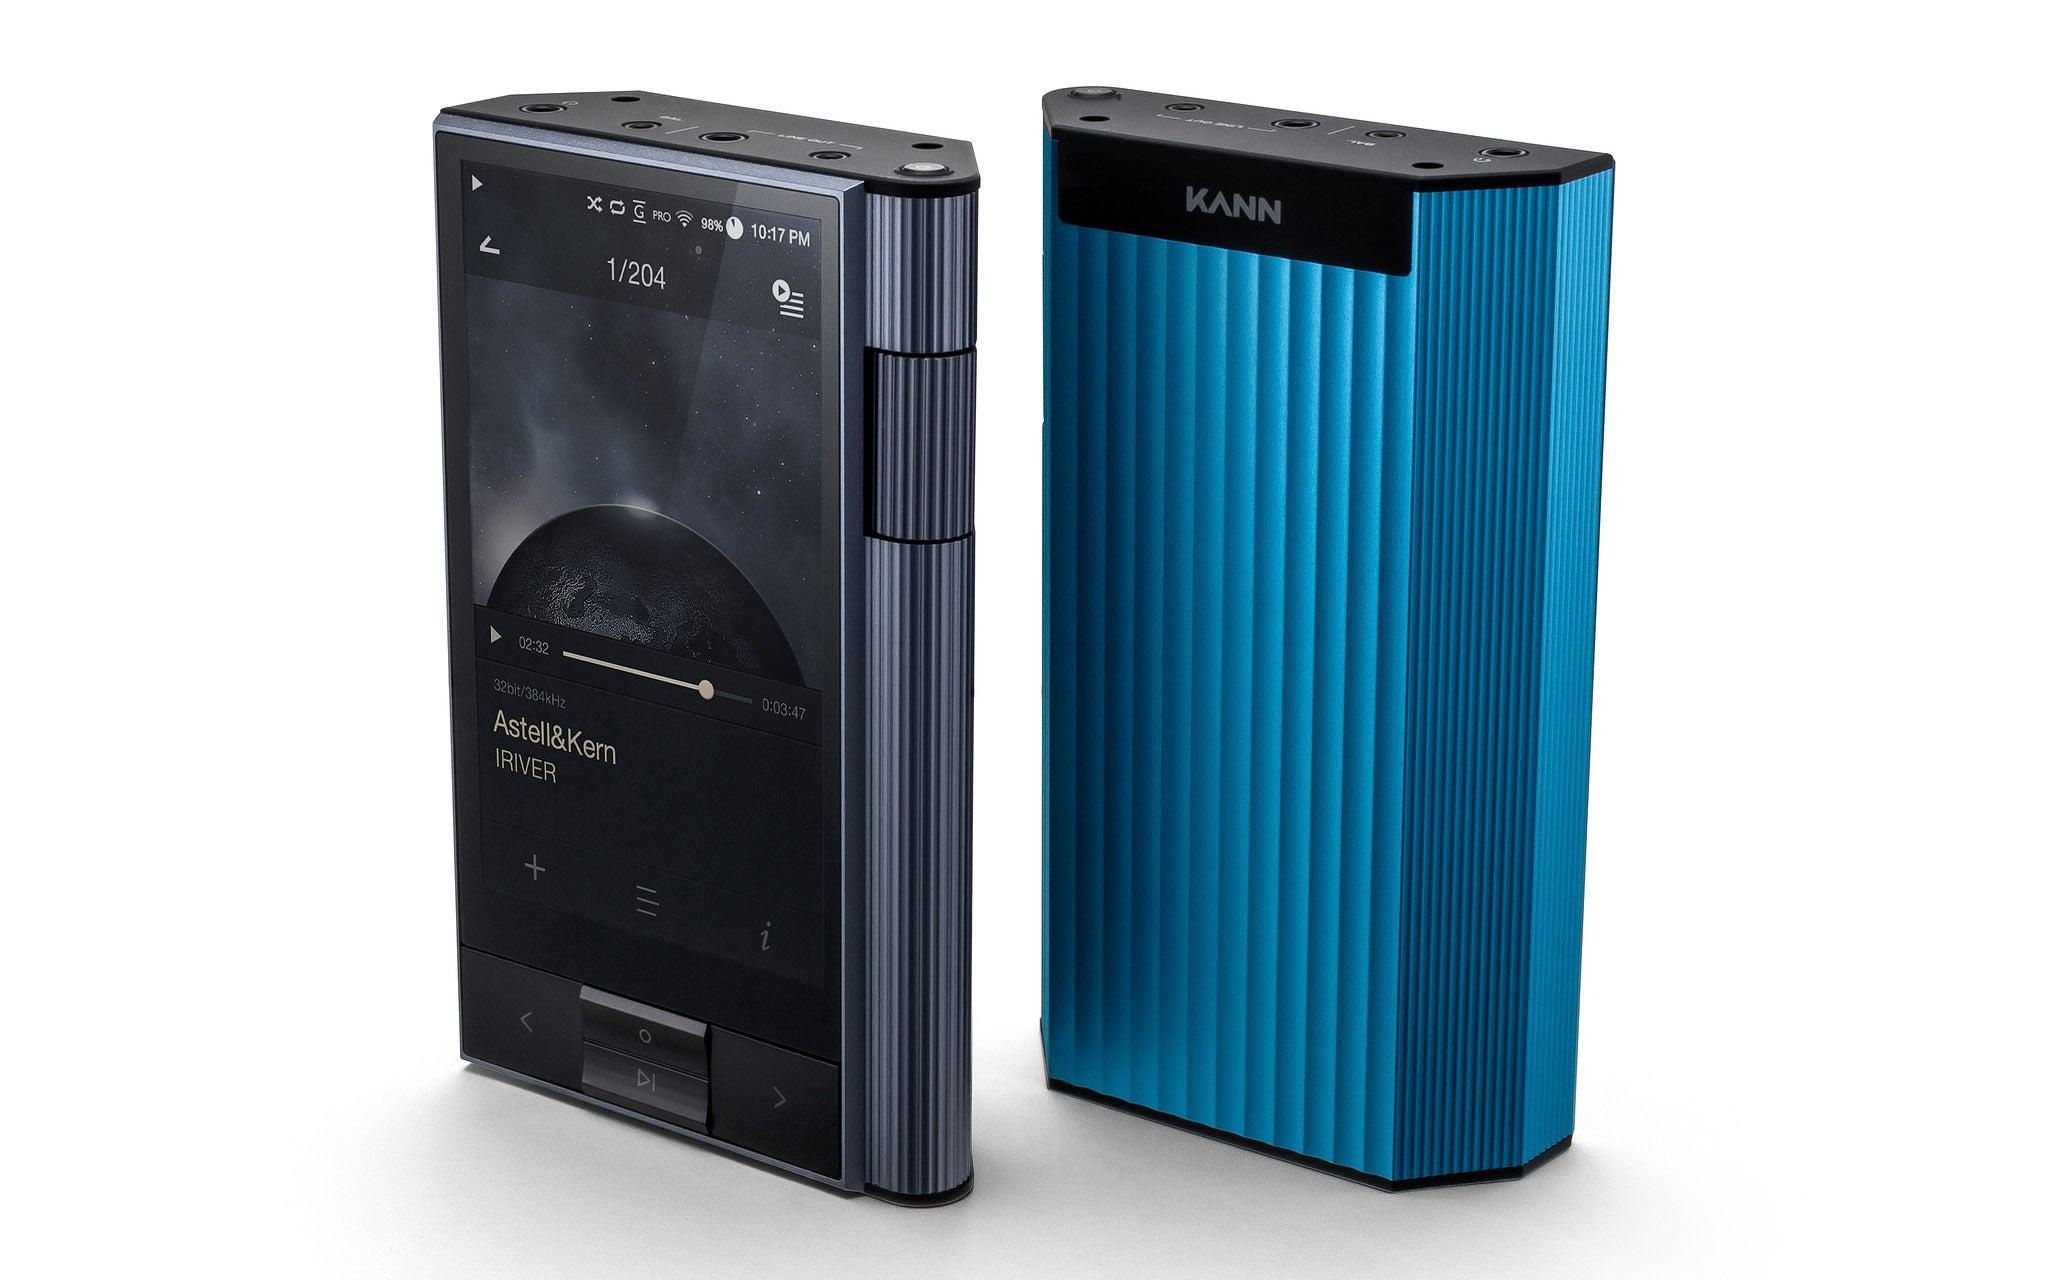 Astell&Kern Kann review: This high-resolution digital audio player ...